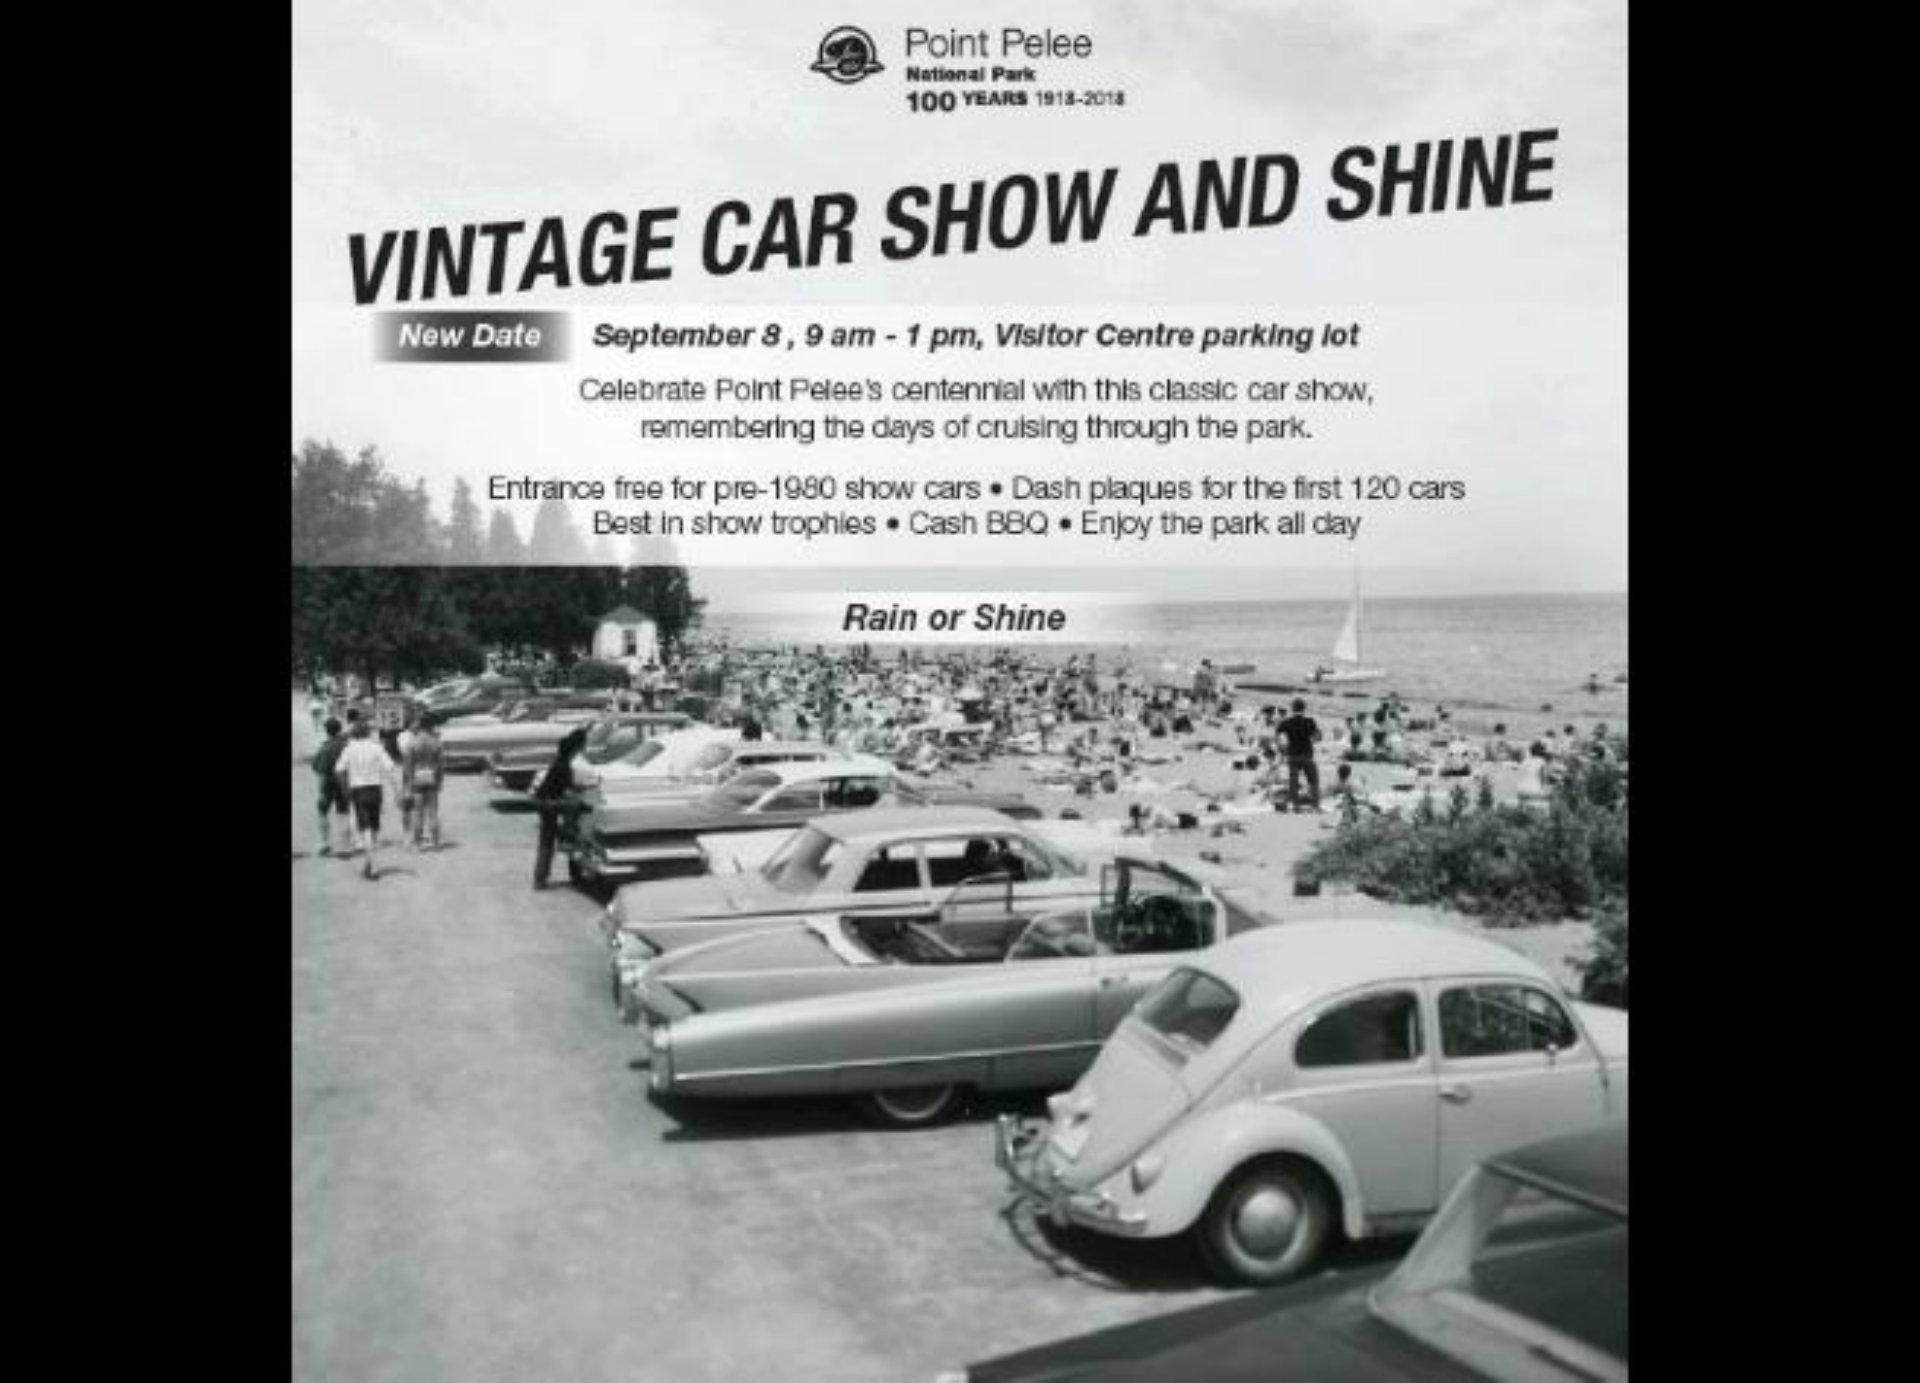 Vintage Car Show And Shine Tourism Windsor Essex Pelee Island - Car show trophies dash plaques